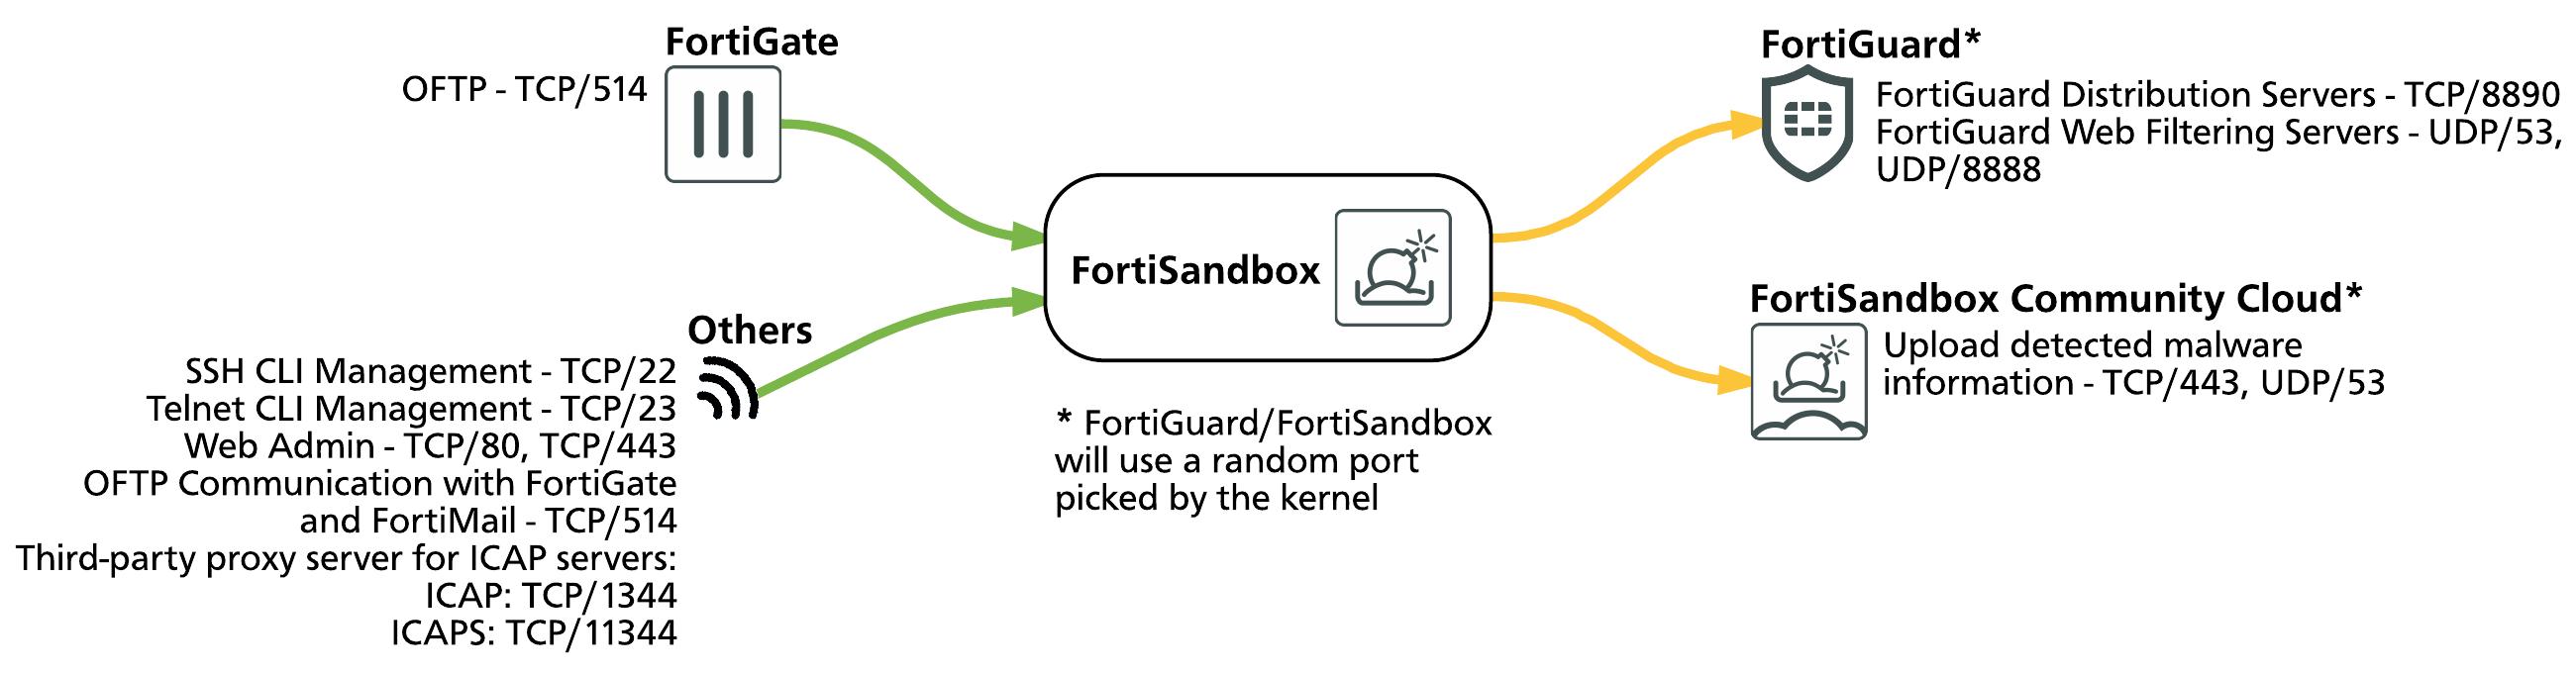 FortiSandbox Open Ports